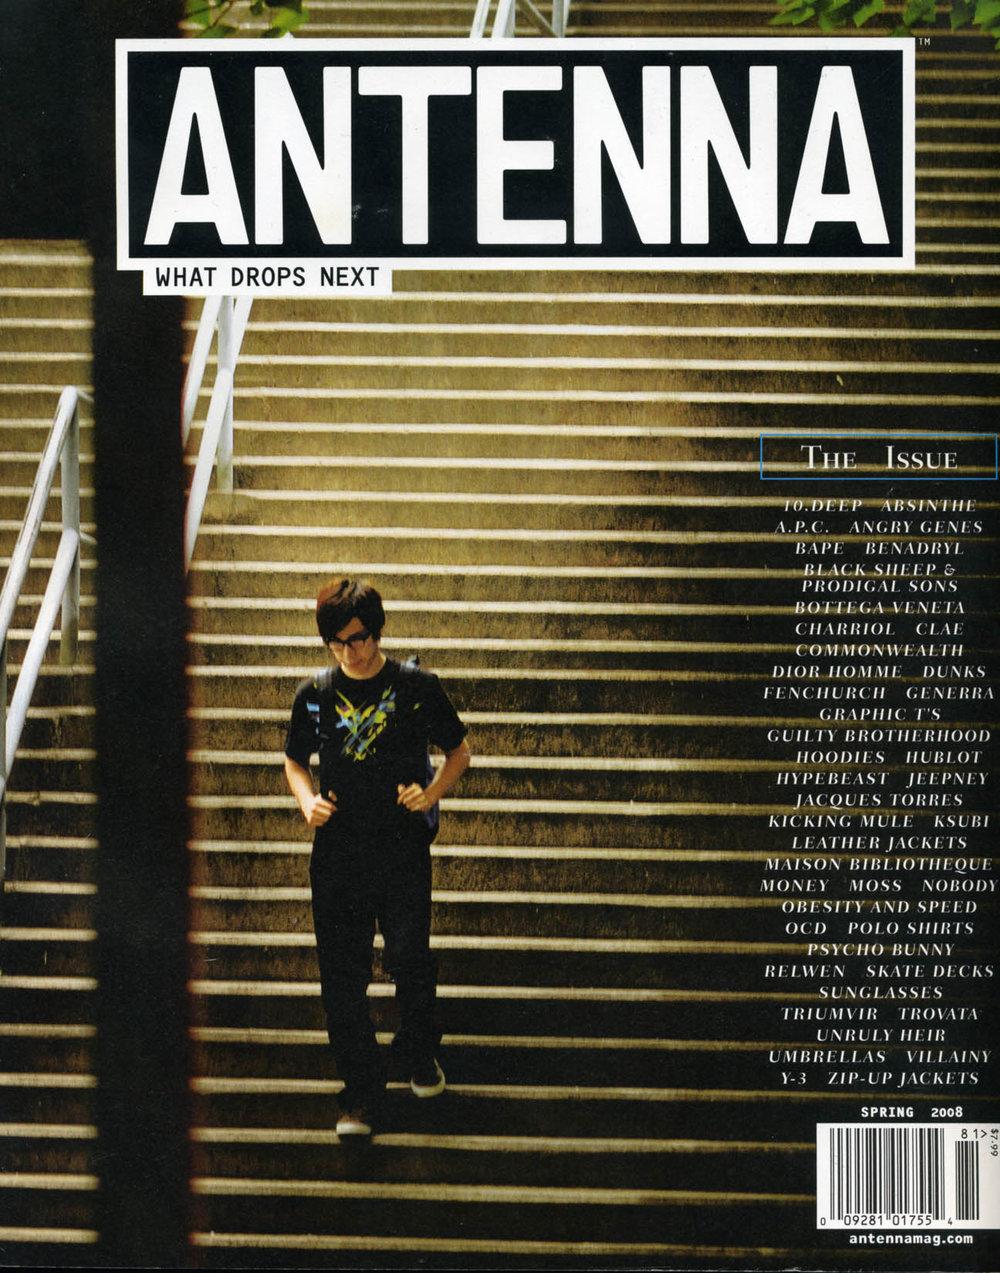 Antenna_Spring2008_1.jpg